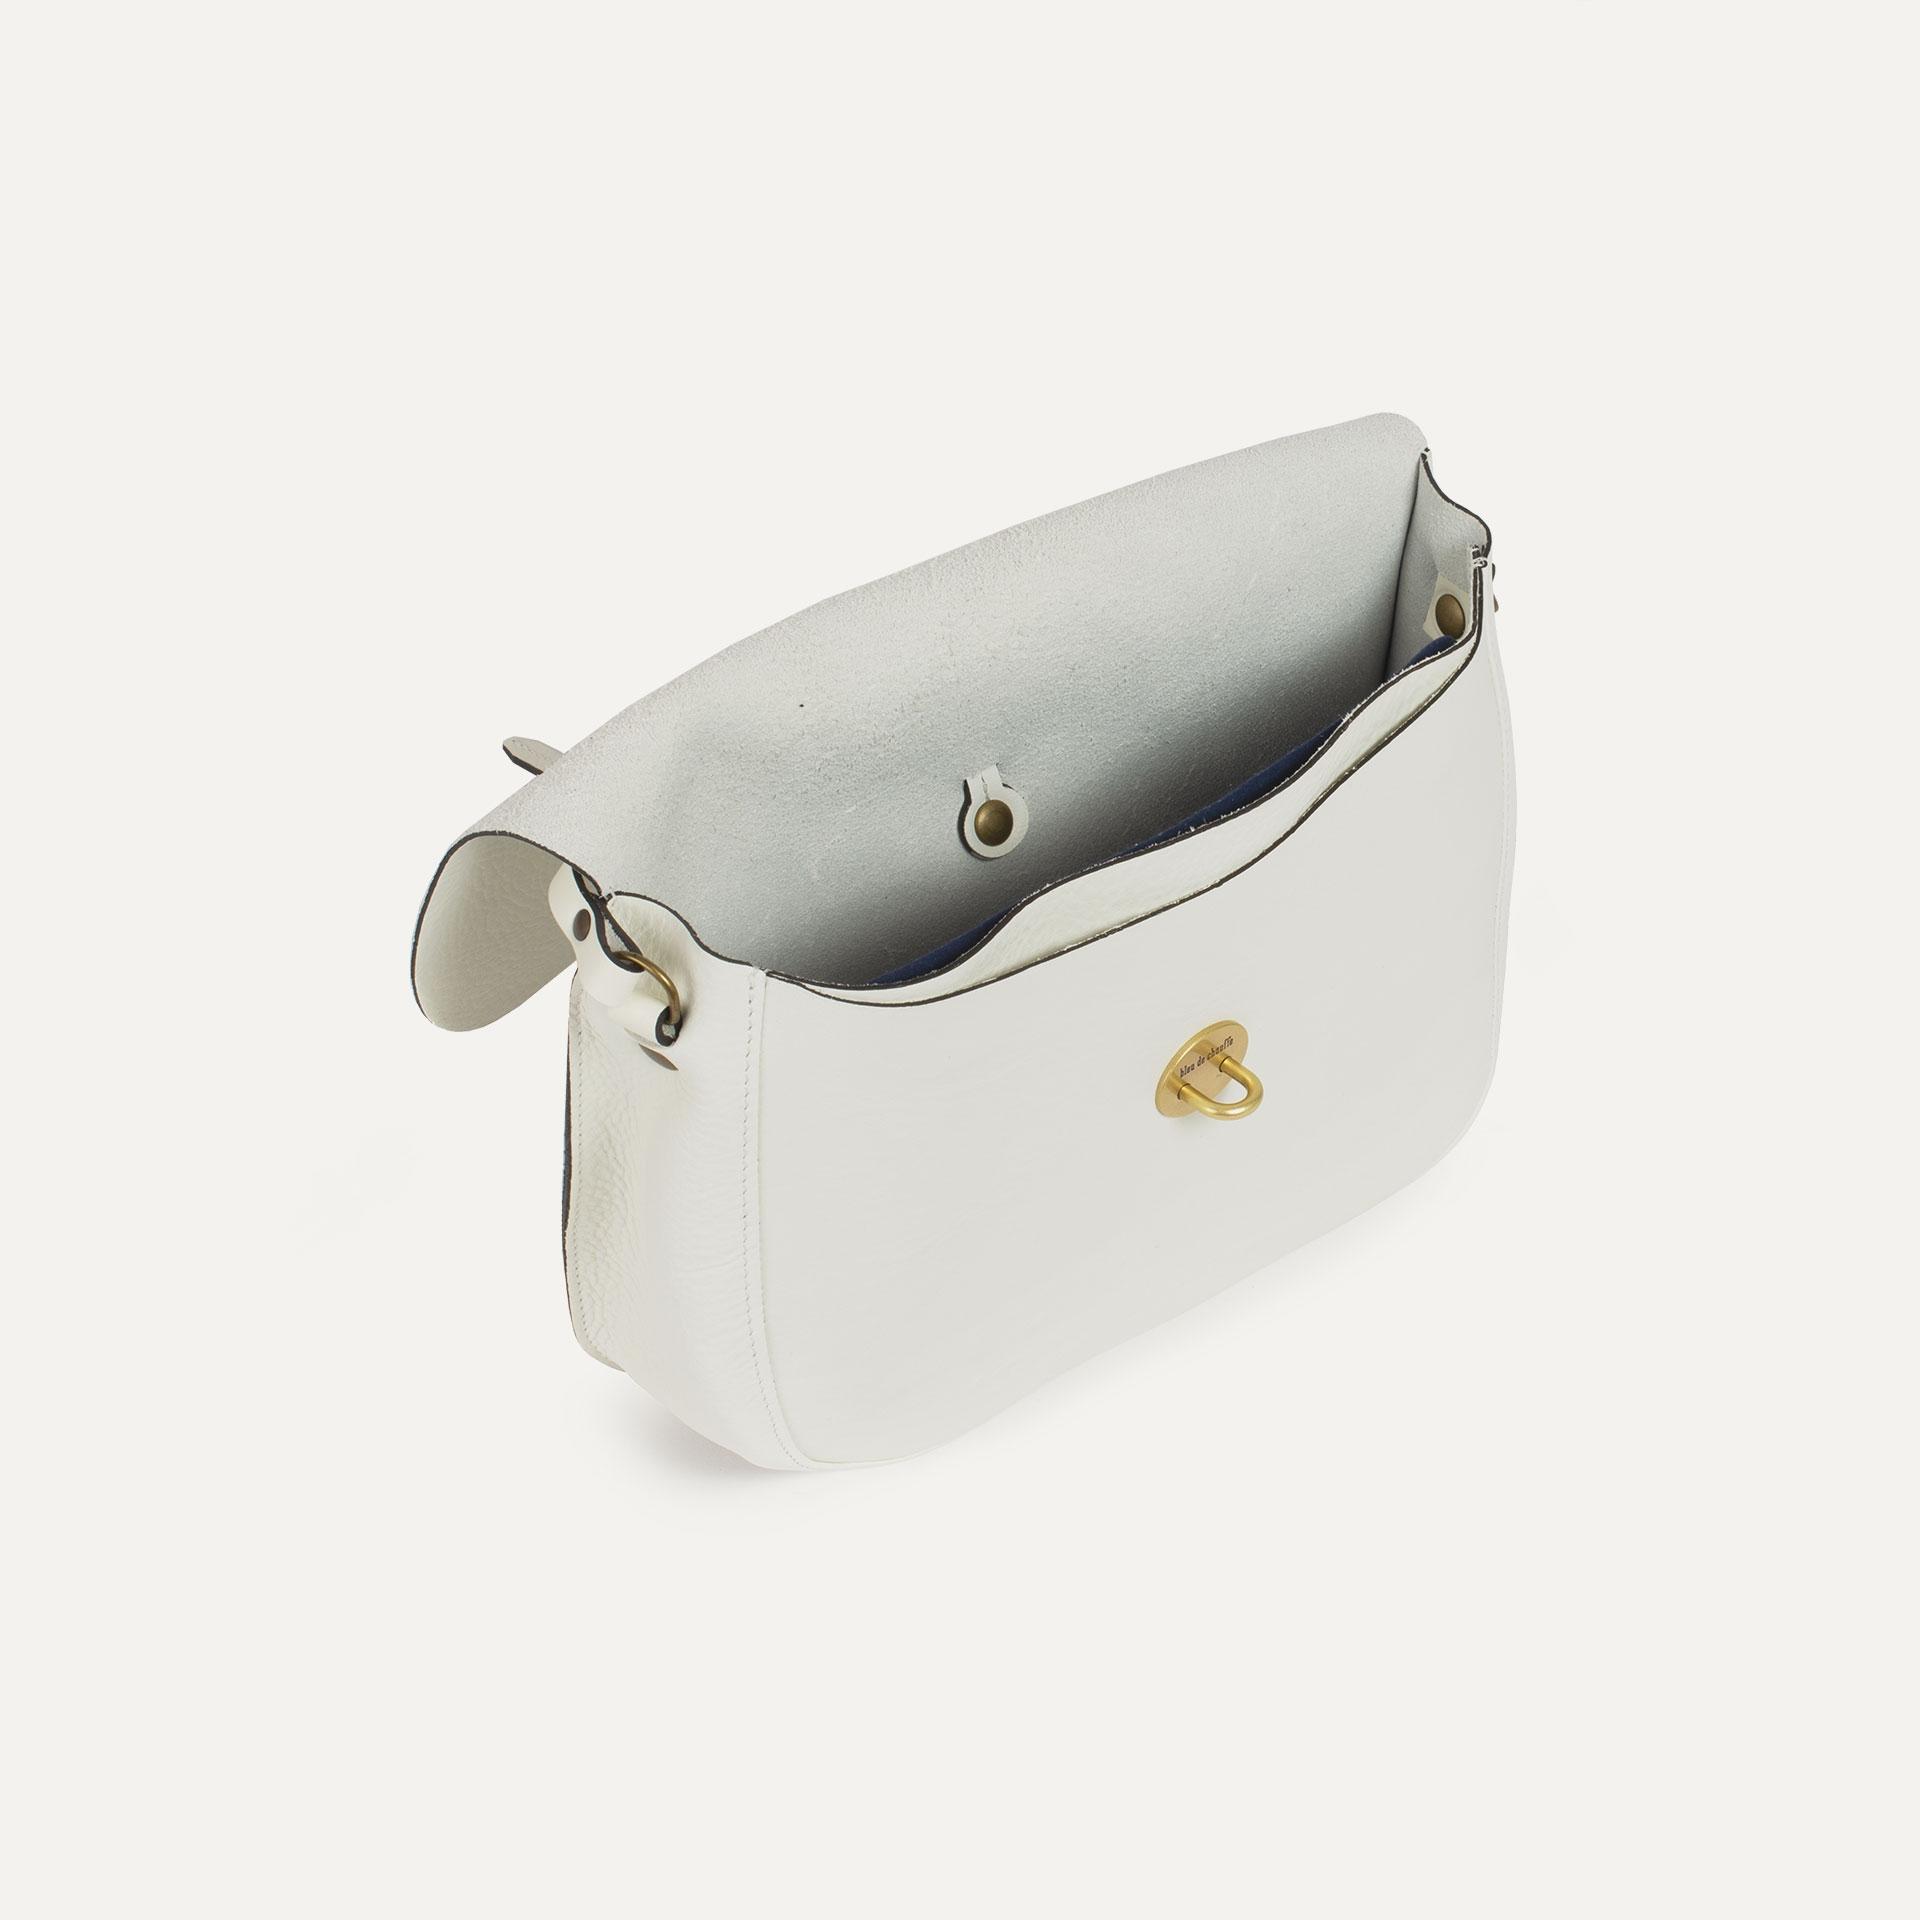 Pastis handbag - White (image n°4)